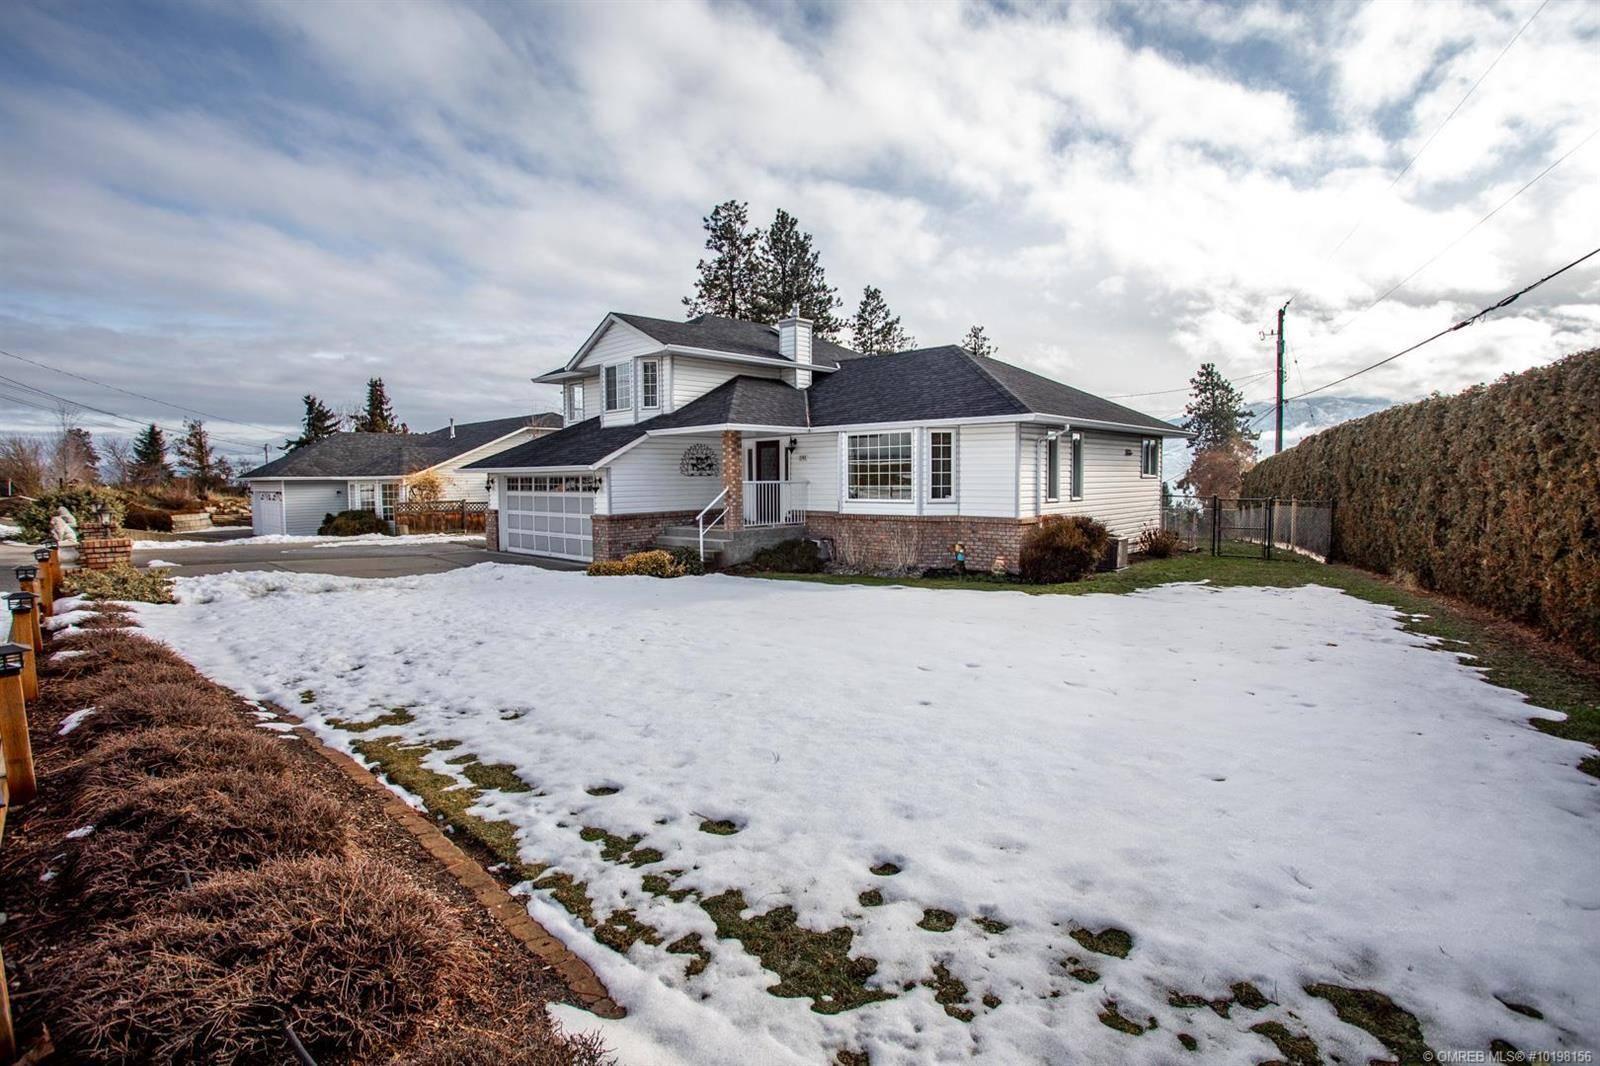 House for sale at 2707 Taneda Rd West Kelowna British Columbia - MLS: 10198156